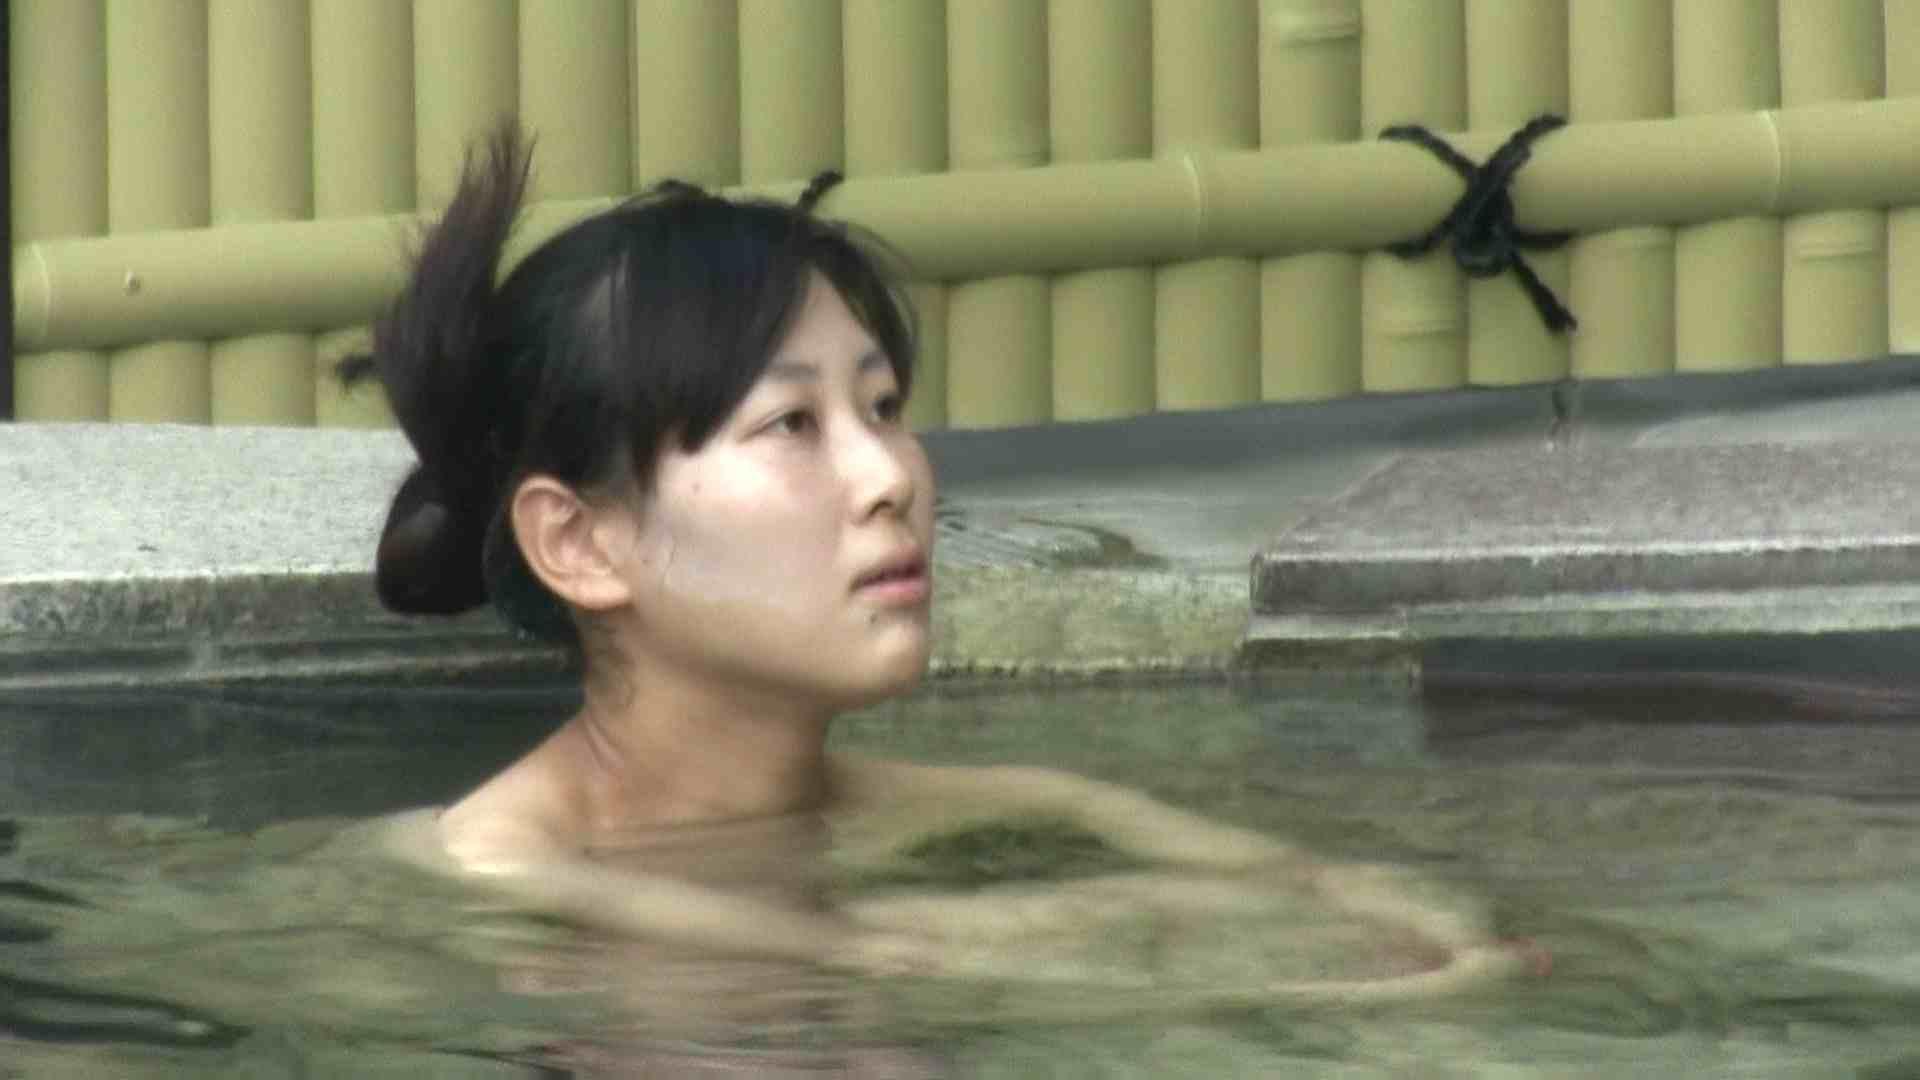 Aquaな露天風呂Vol.665 綺麗なOLたち  85枚 24